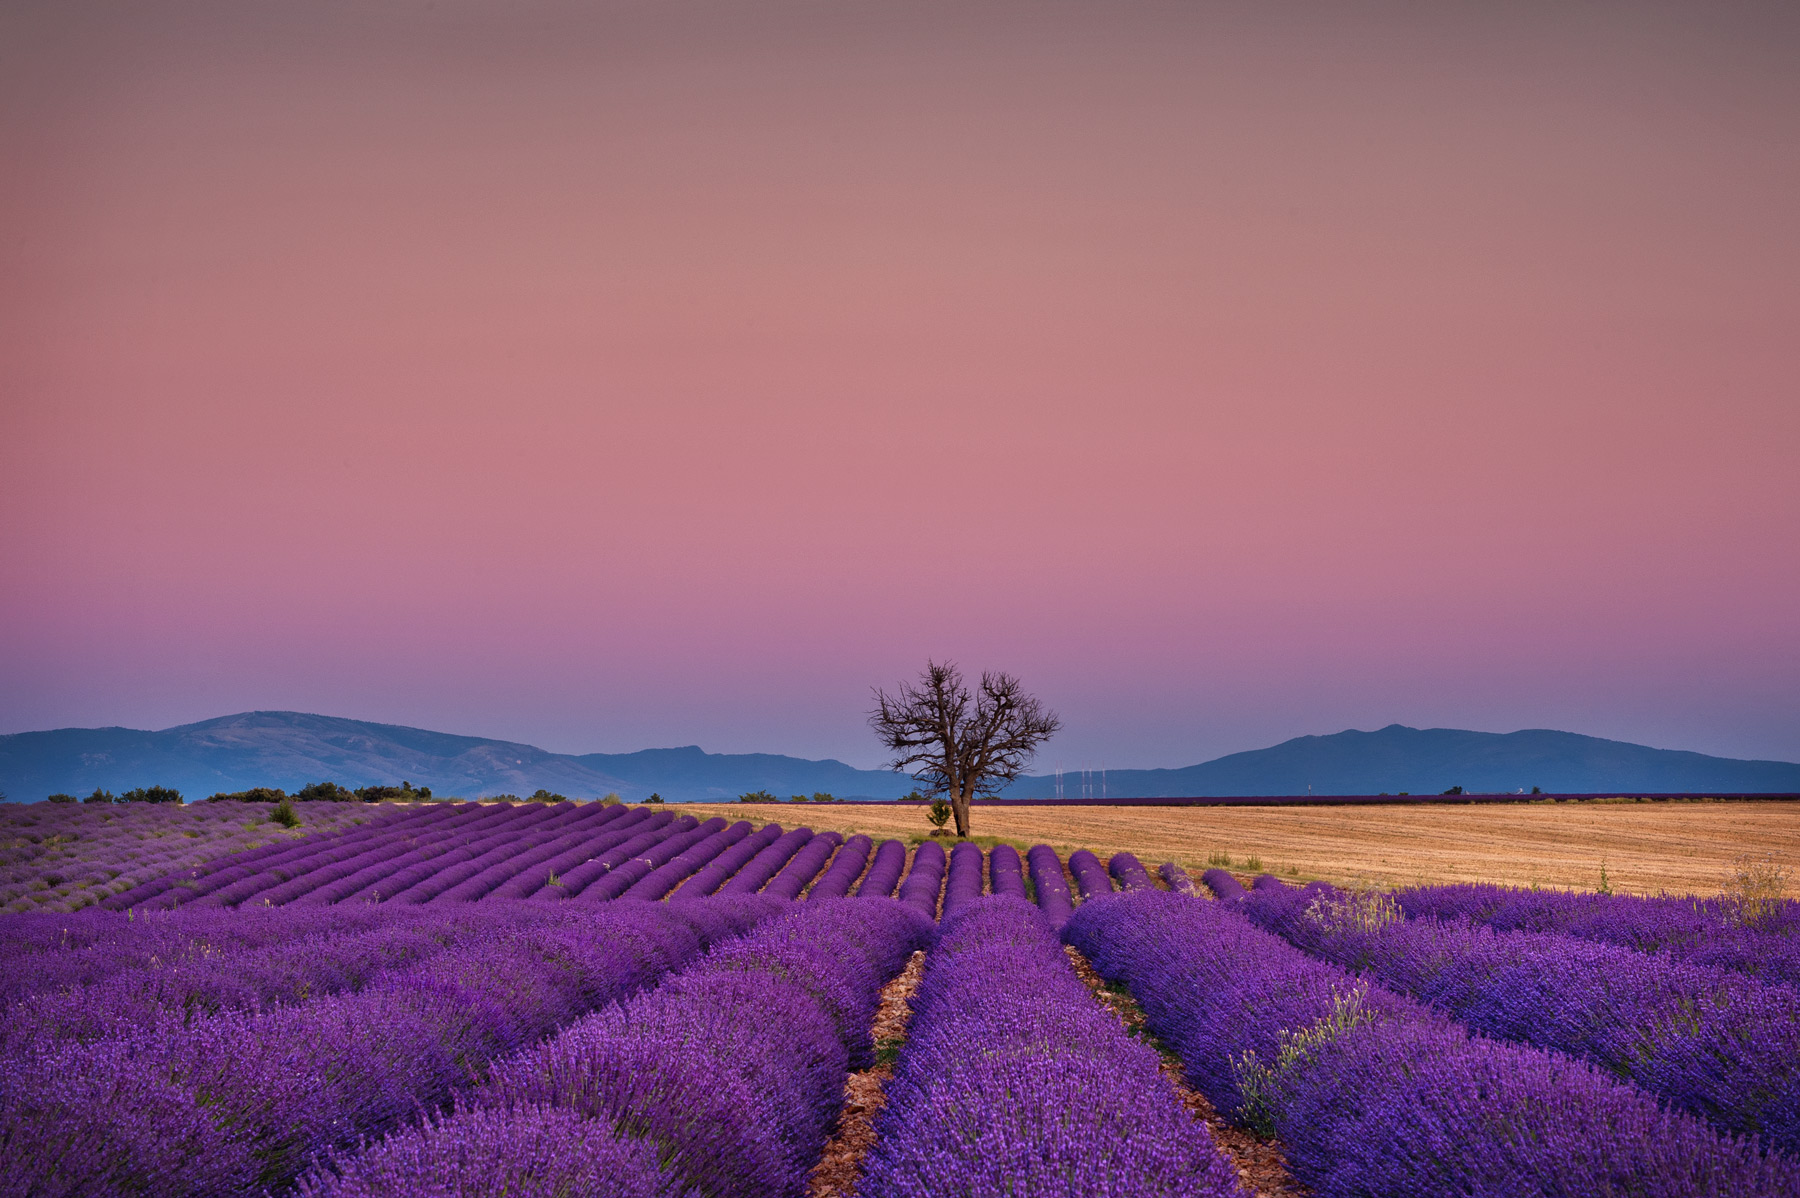 LavenderSunsetSkyFrance.jpg